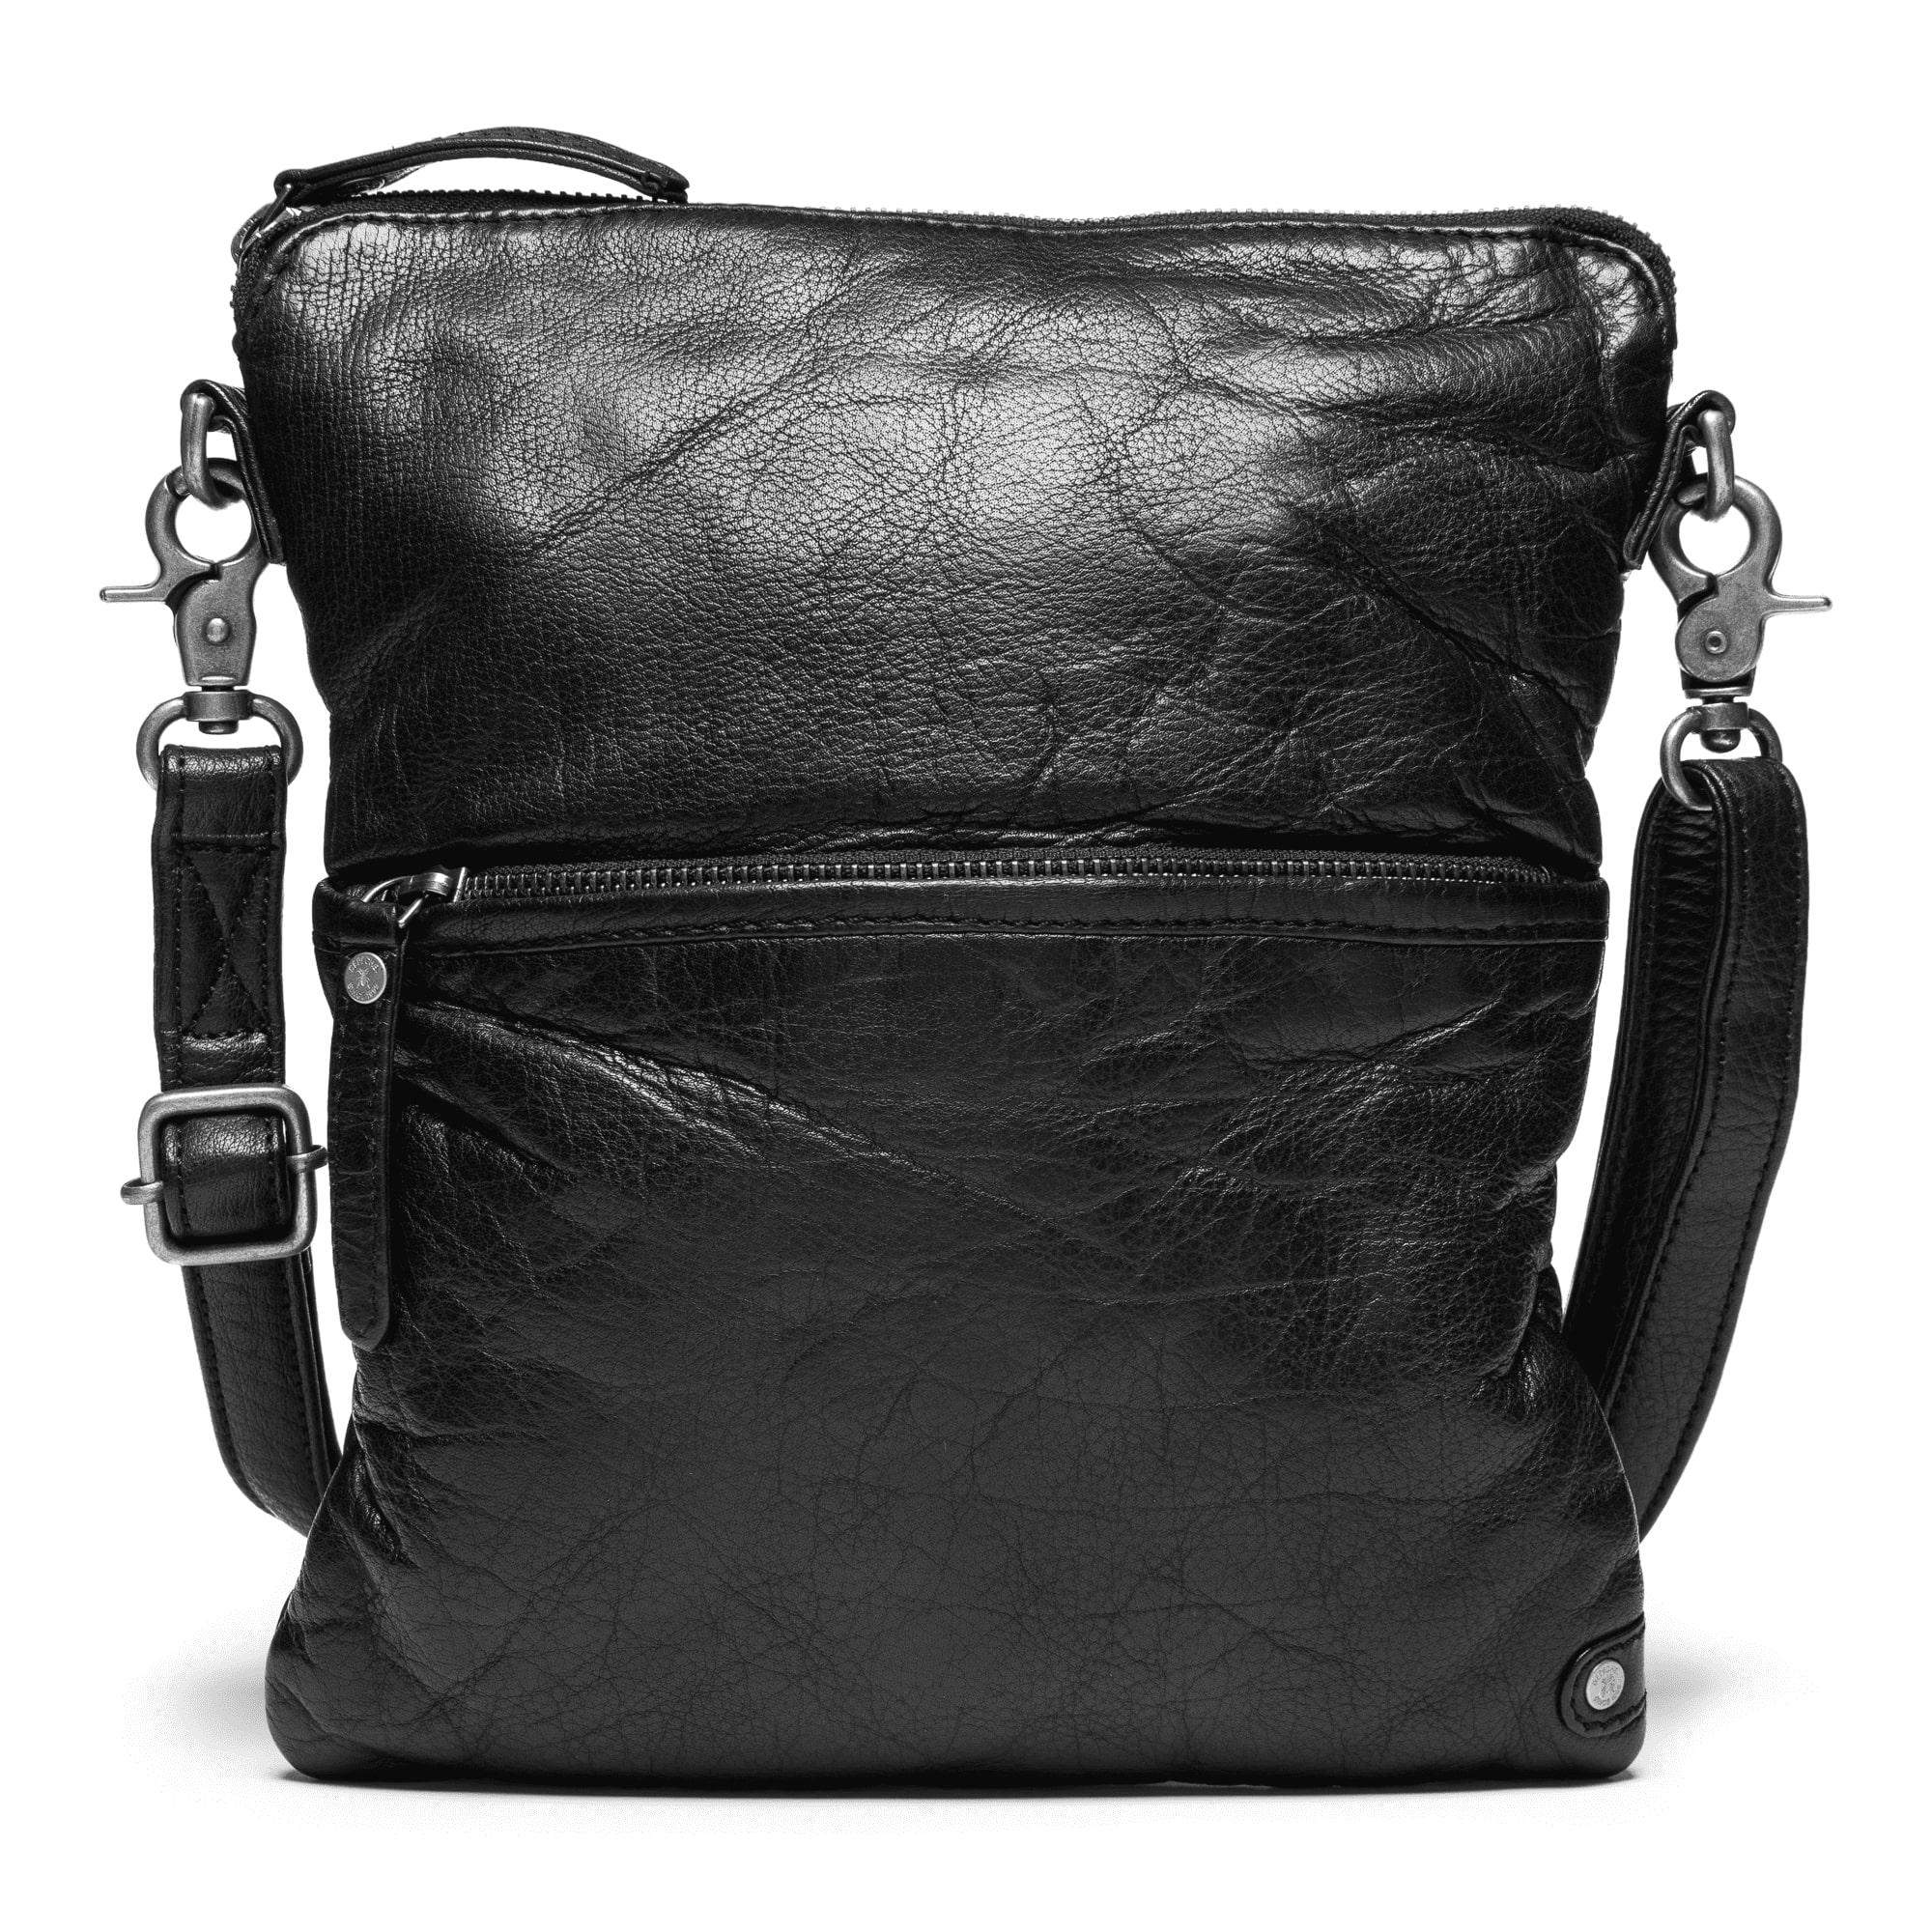 Depeche 11608 crossover taske, black